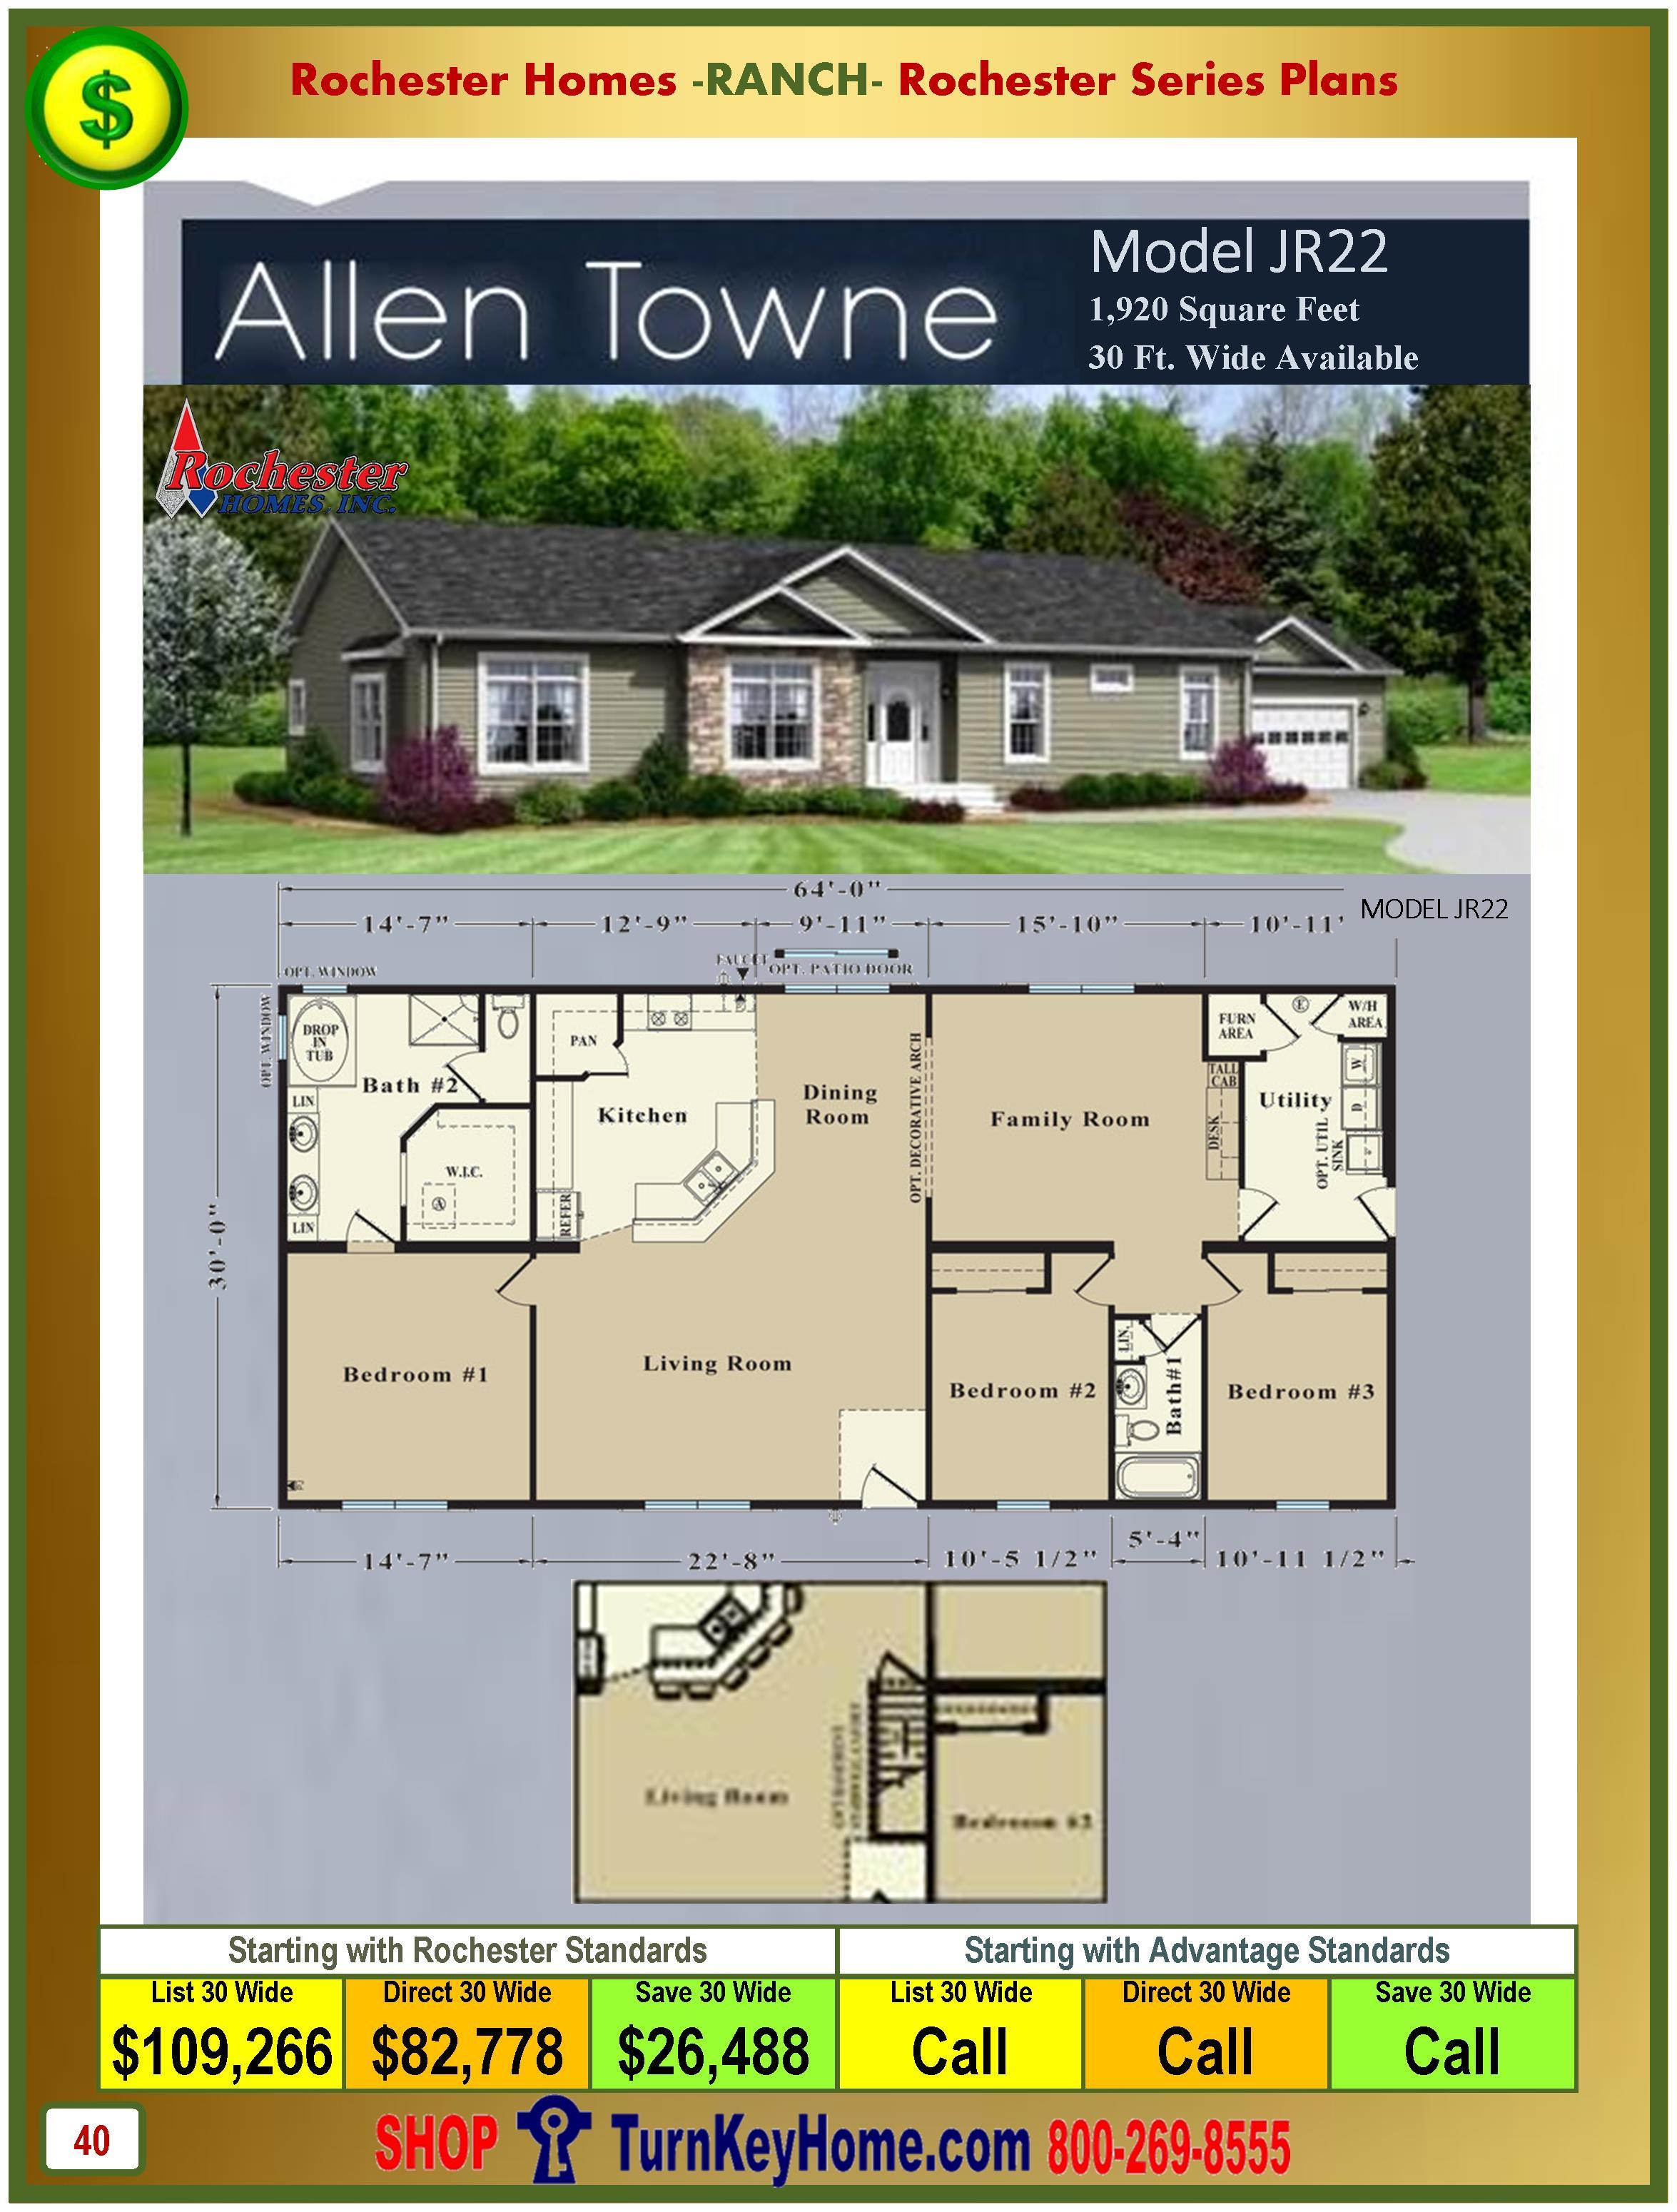 Modular.Homes.Rochester.Home.Inc.Allen.Towne.JR22.Ranch.Plan.Price.Catalog.P40.1215